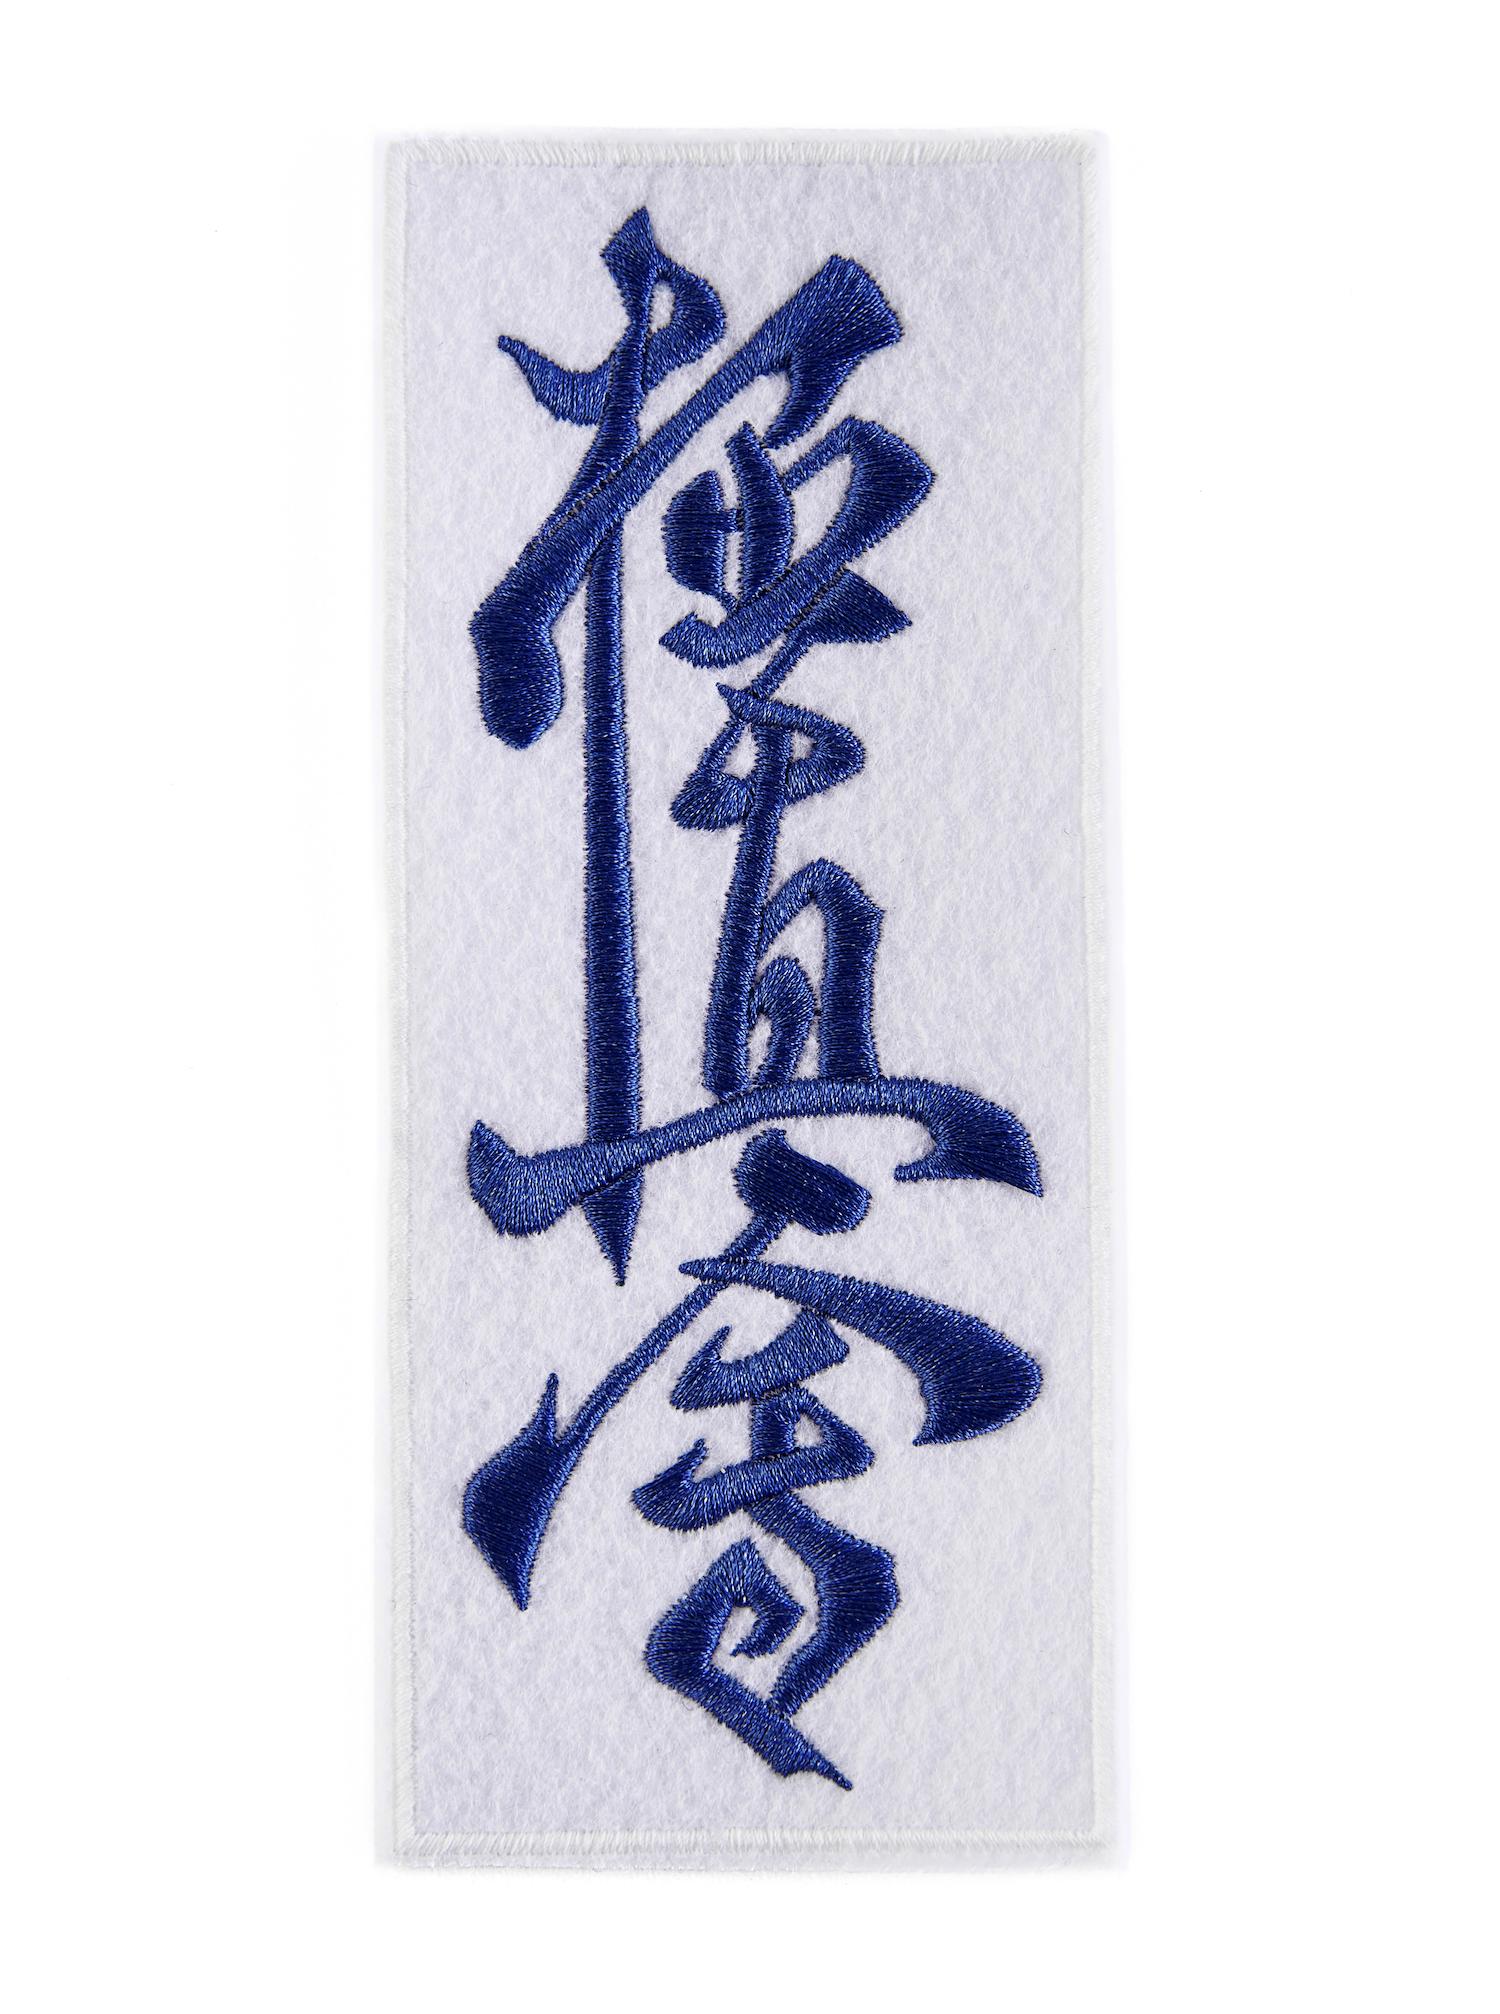 Аксессуары (брелки, шевроны, нашивки) Шеврон KYOKUSHINKAI IP-20.jpg